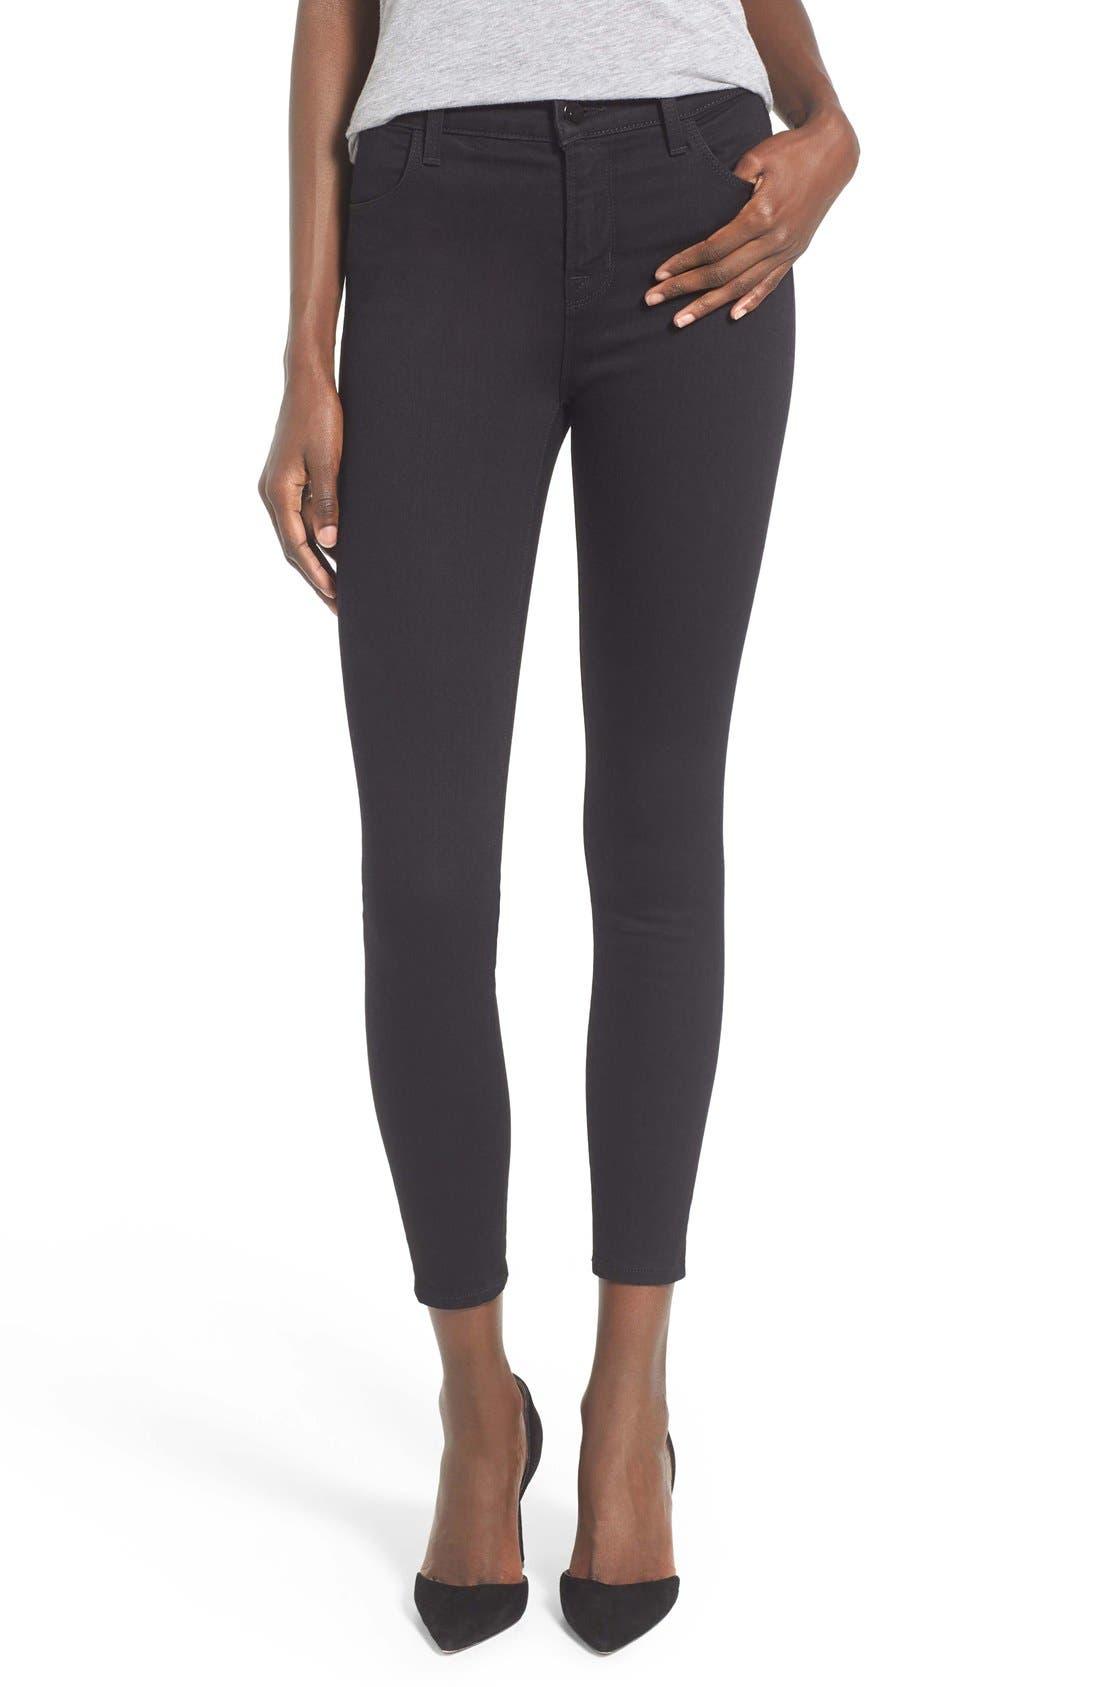 Alana High Waist Crop Skinny Jeans,                         Main,                         color, 002